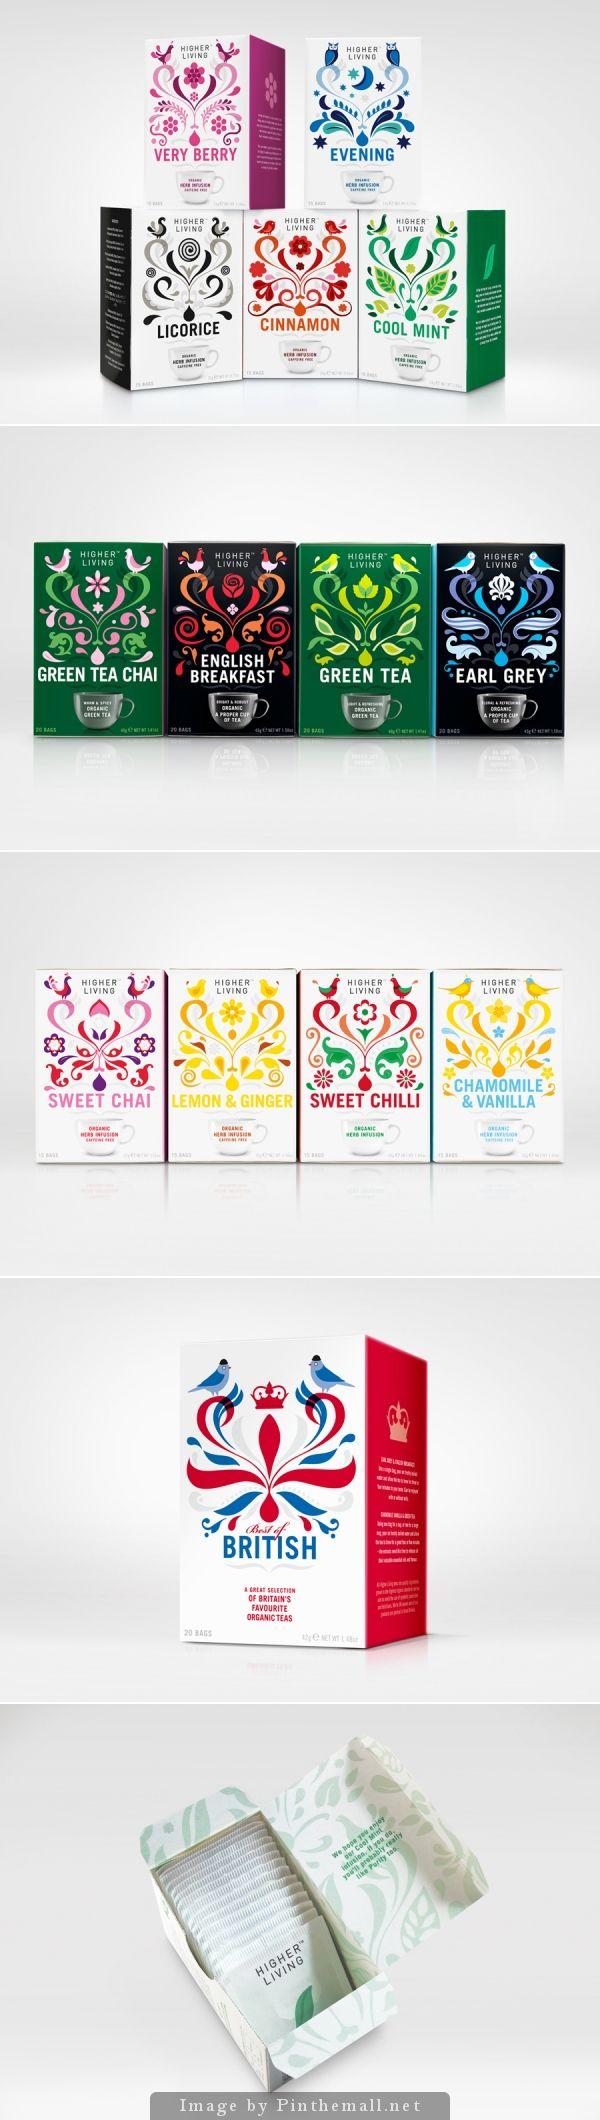 Higher Living Tea packaging designed by B&B Studio   BP&O